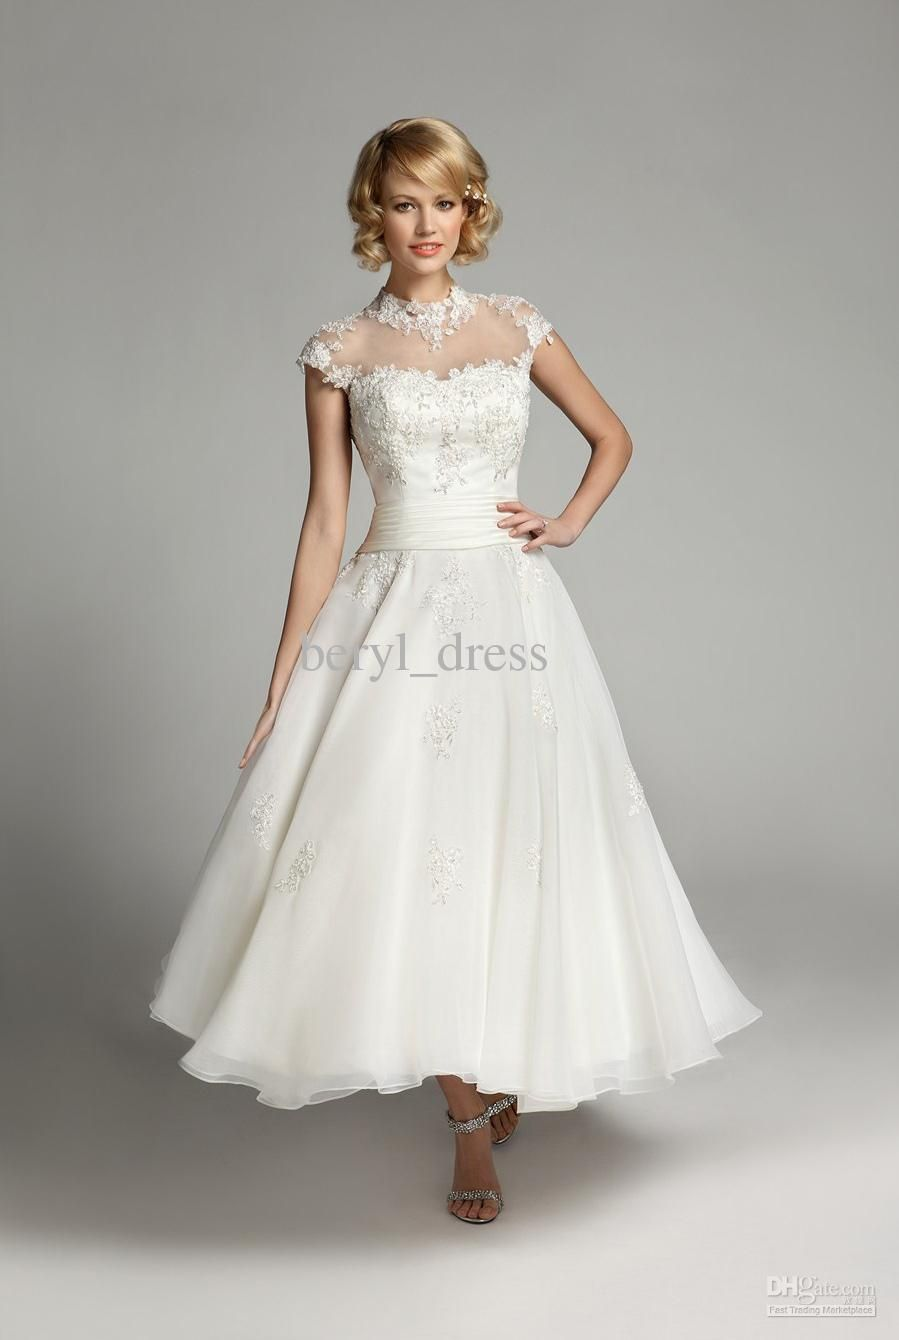 Ankle Length Bridal Dresses